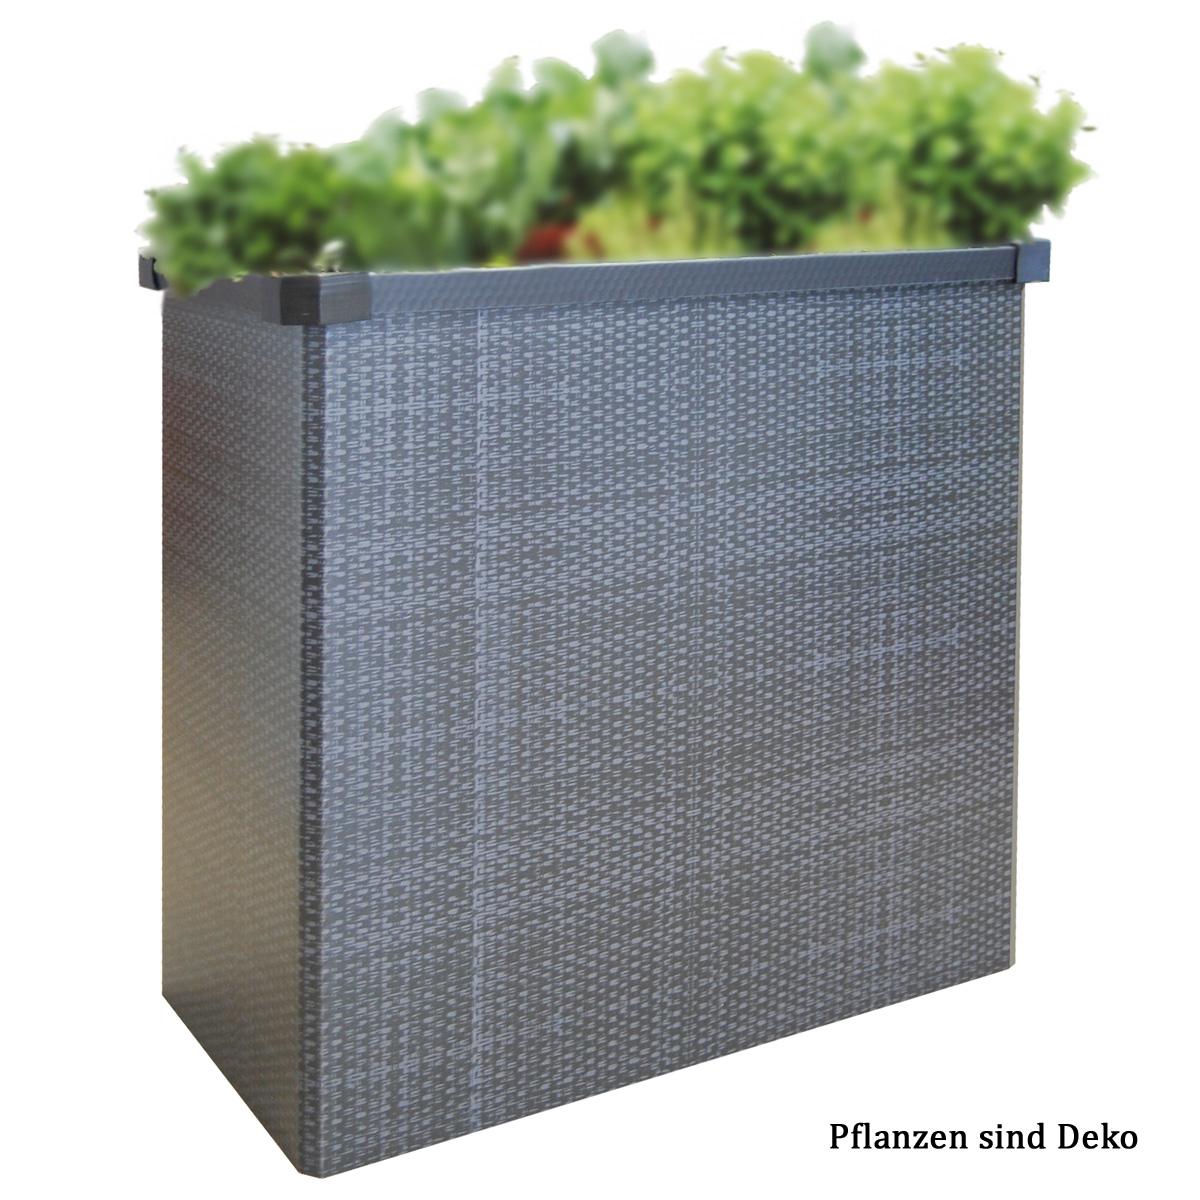 Bild zu JUWEL Falt-Hochbeet Rattan-Optik Easy Garden